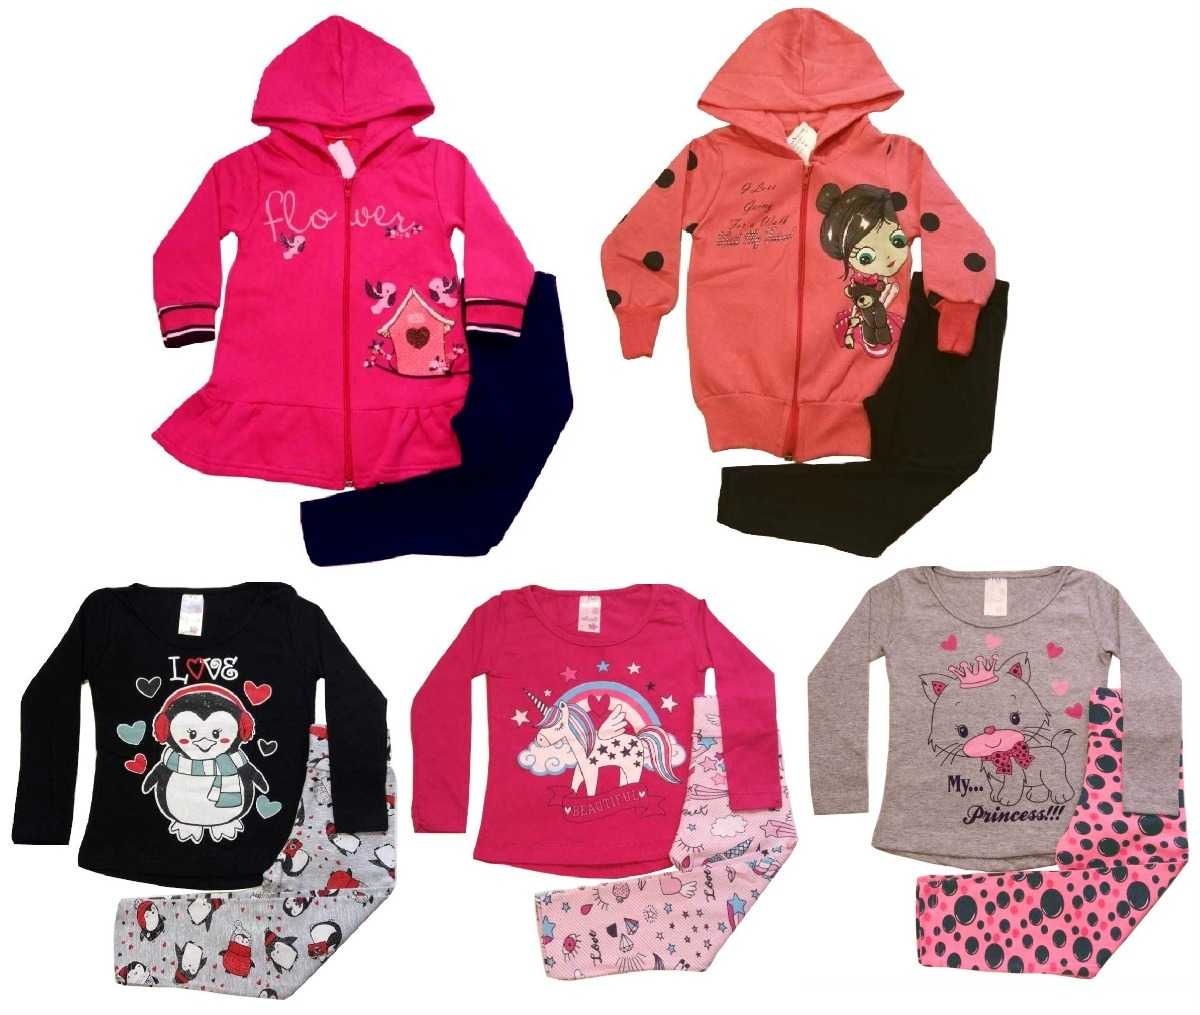 cc045939e63ed1 Kit Lote 5 Conjuntos Infantil Feminino Atacado Roupa Inverno